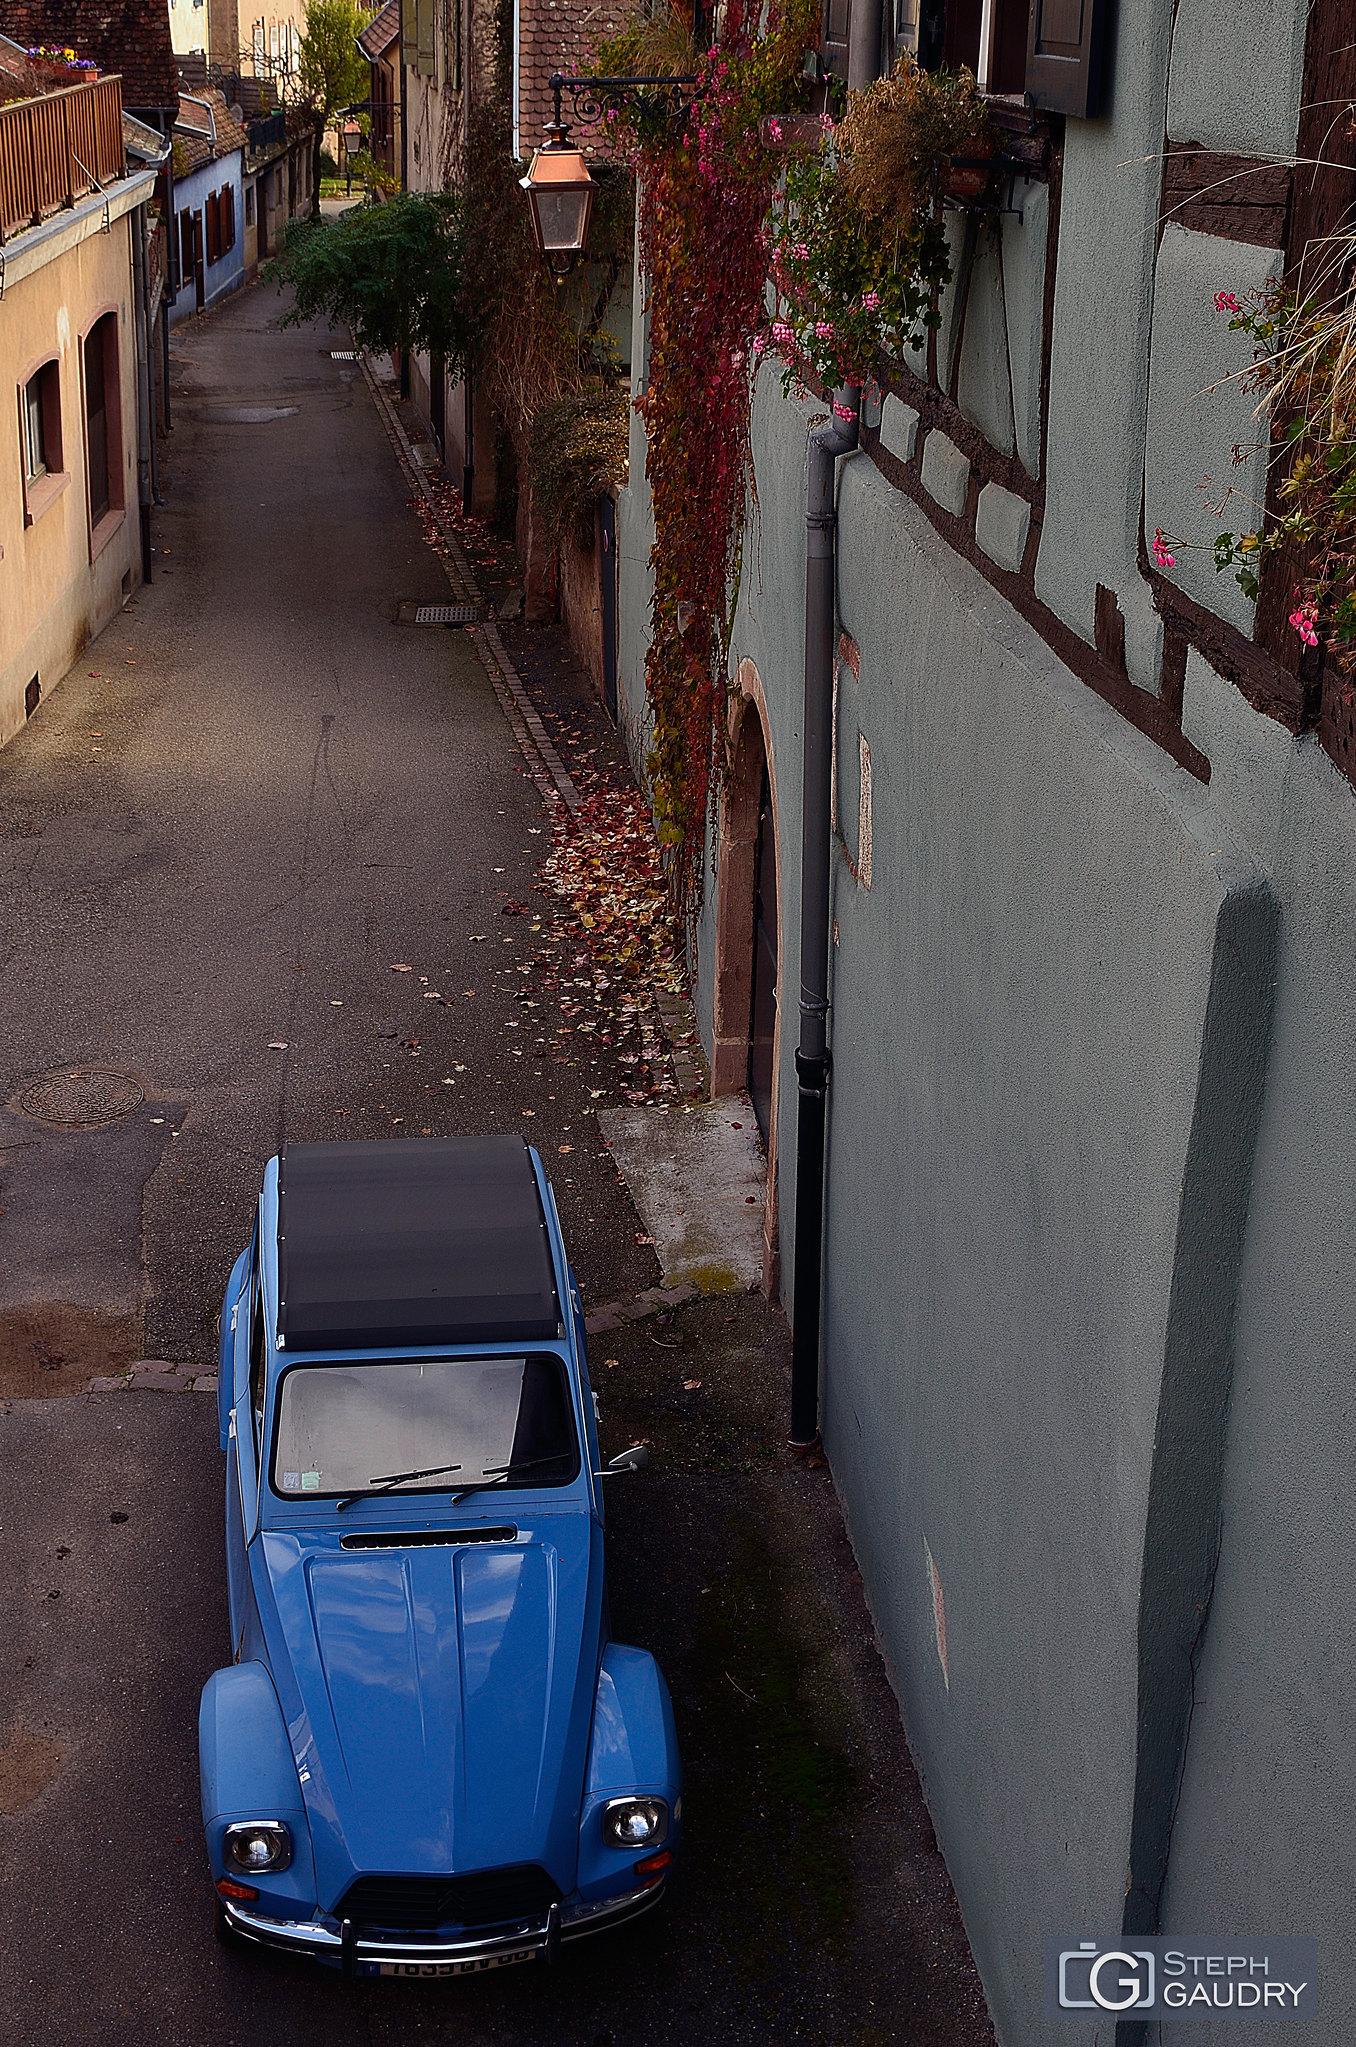 Citroën Dyane [Click to start slideshow]